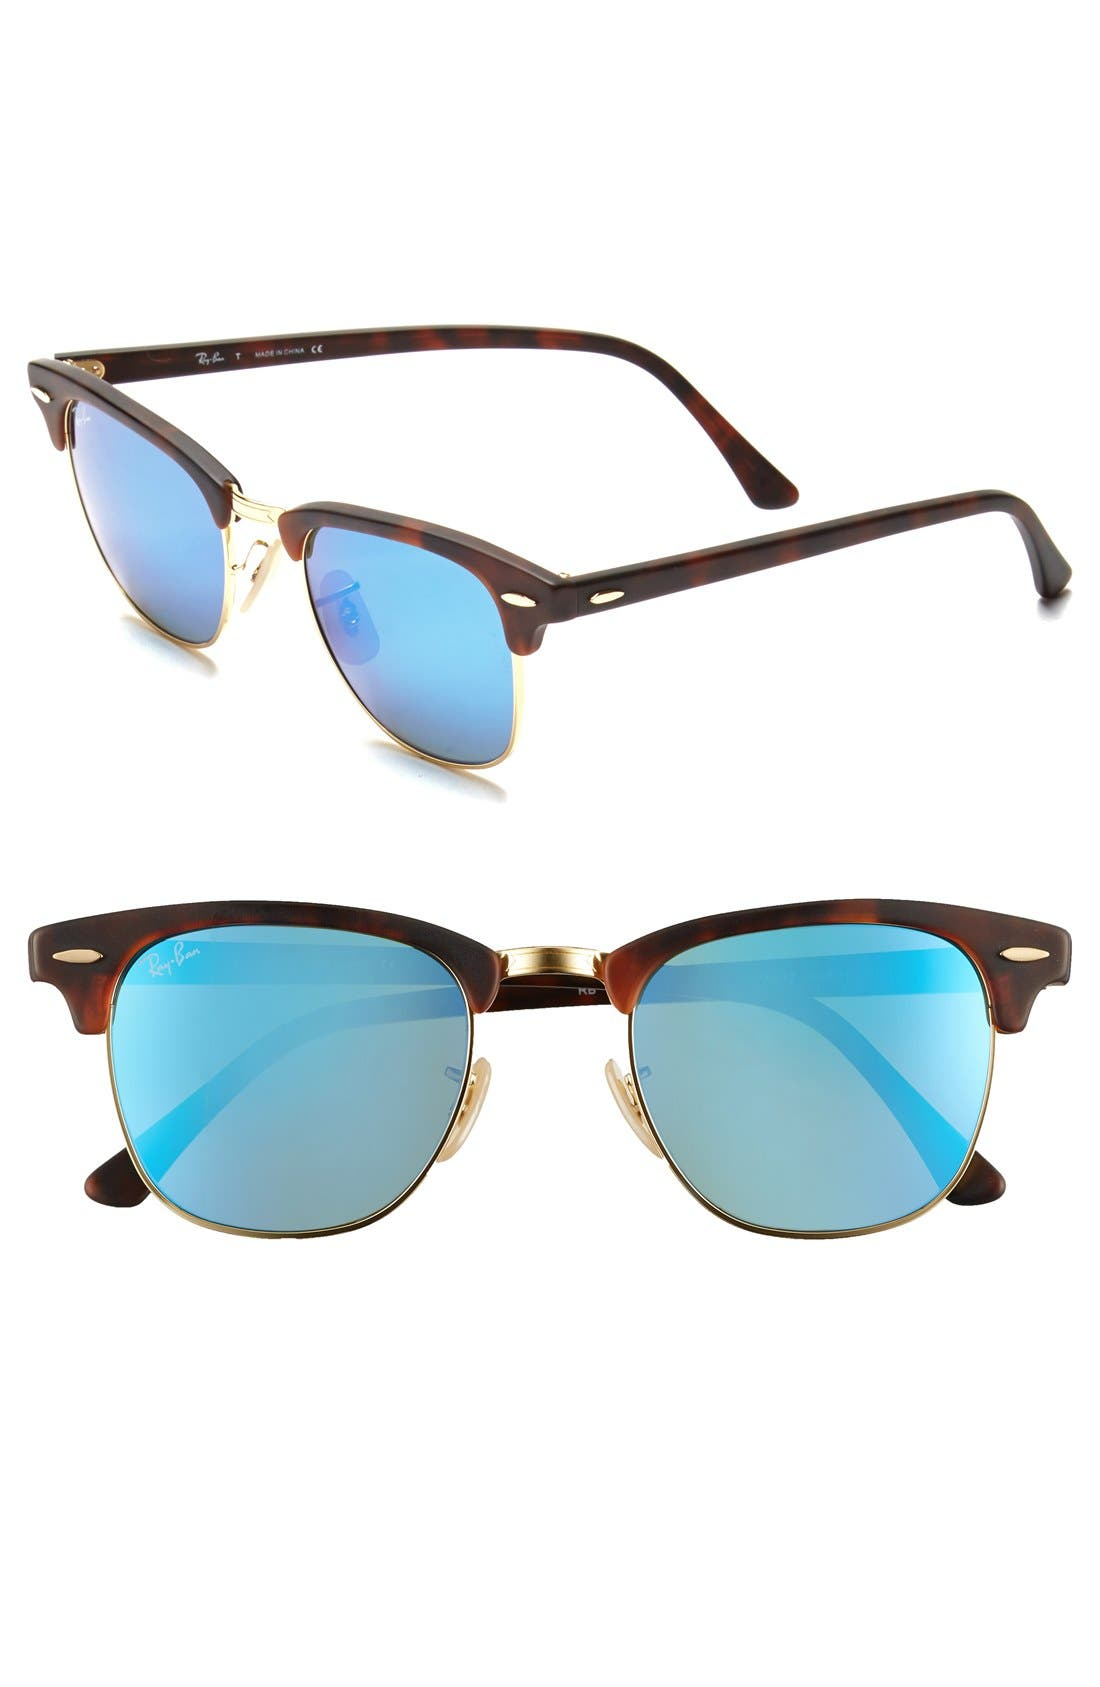 Main Image - Ray-Ban 'Flash Clubmaster' 51mm Sunglasses